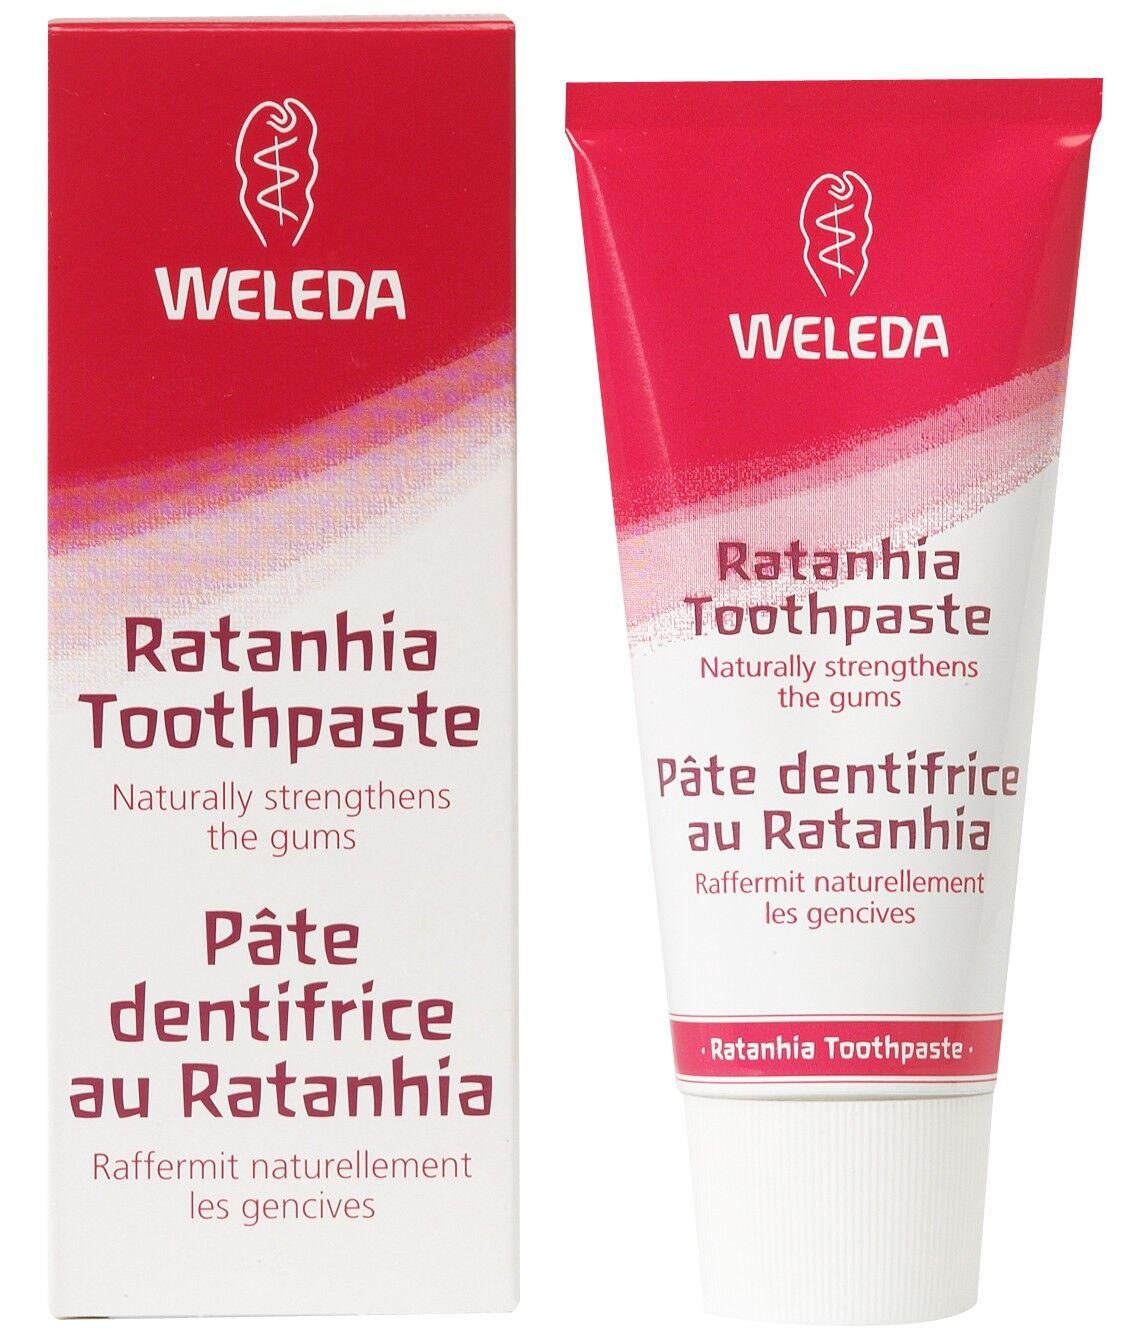 Weleda Dentifrice au Ratanhia - Renforcement naturel des gencives 75 ml - Weleda